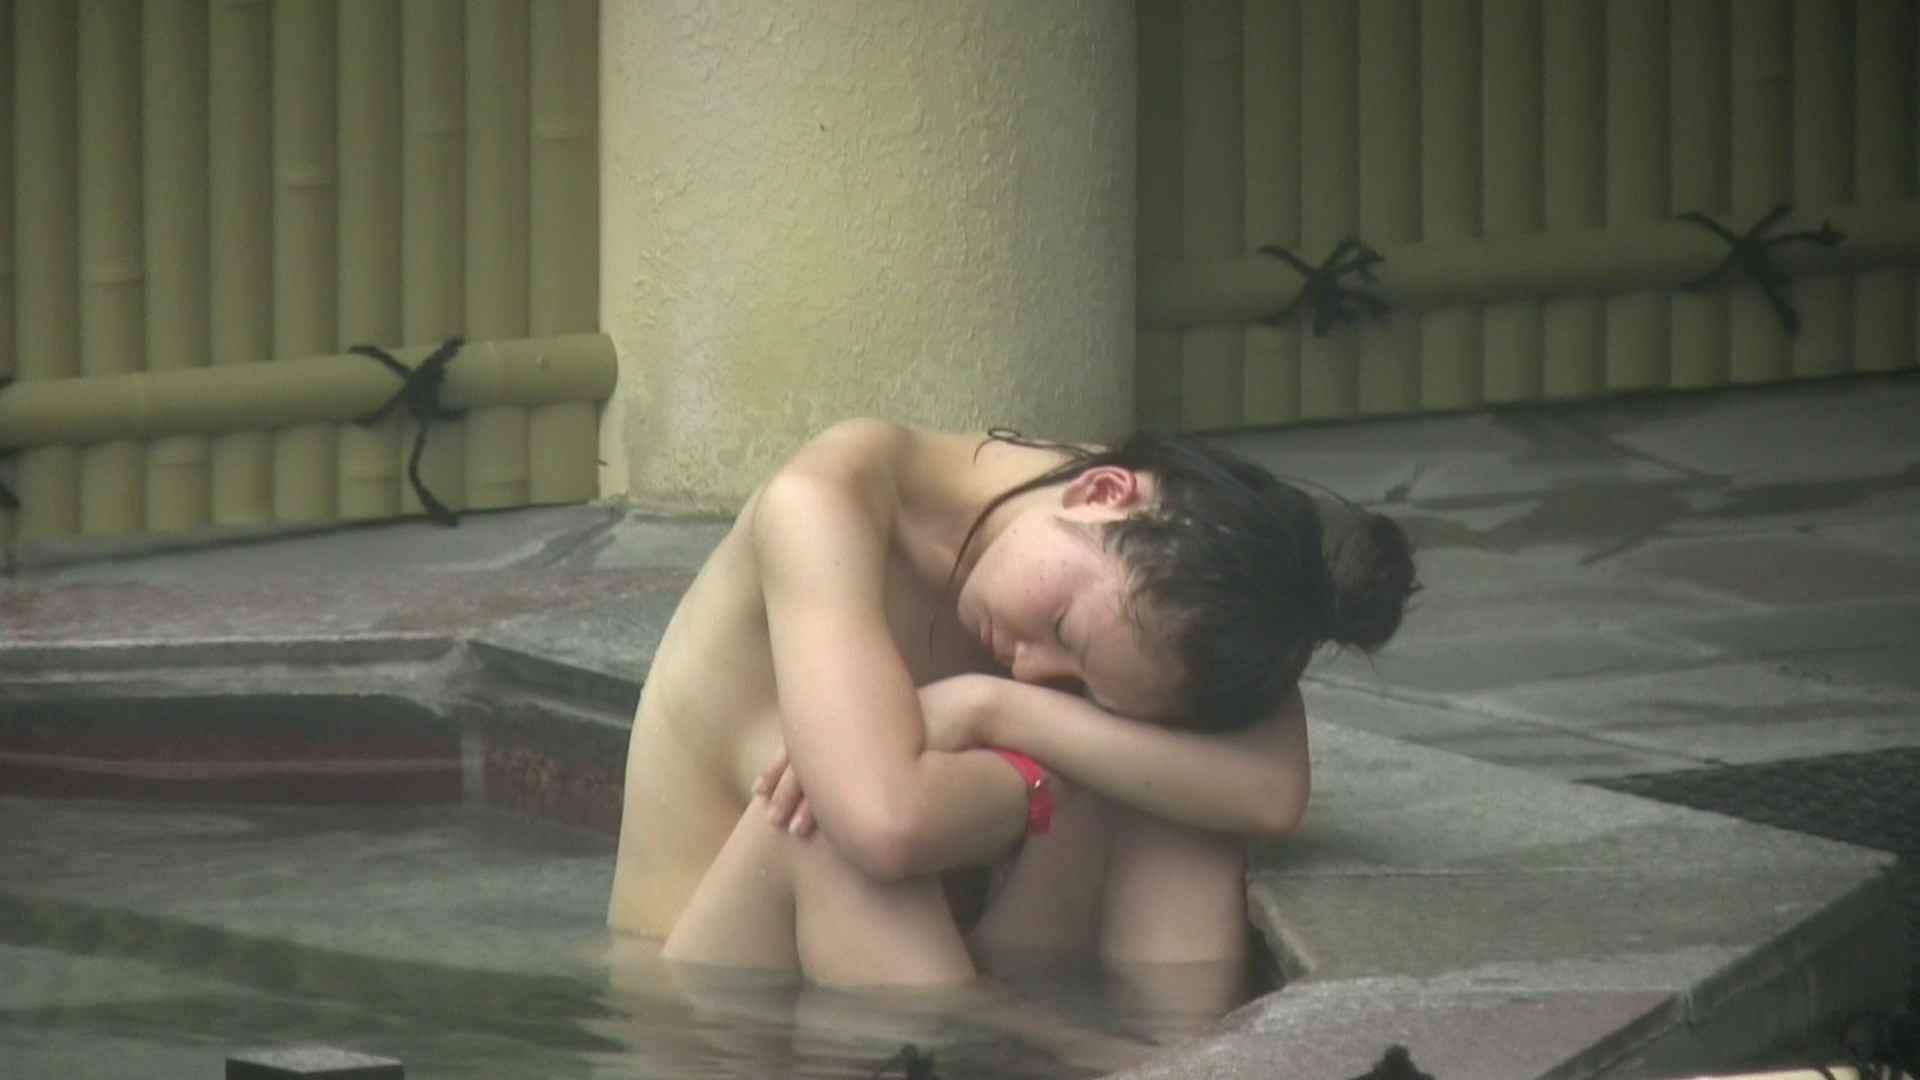 Aquaな露天風呂Vol.137 HなOL ヌード画像 92pic 14